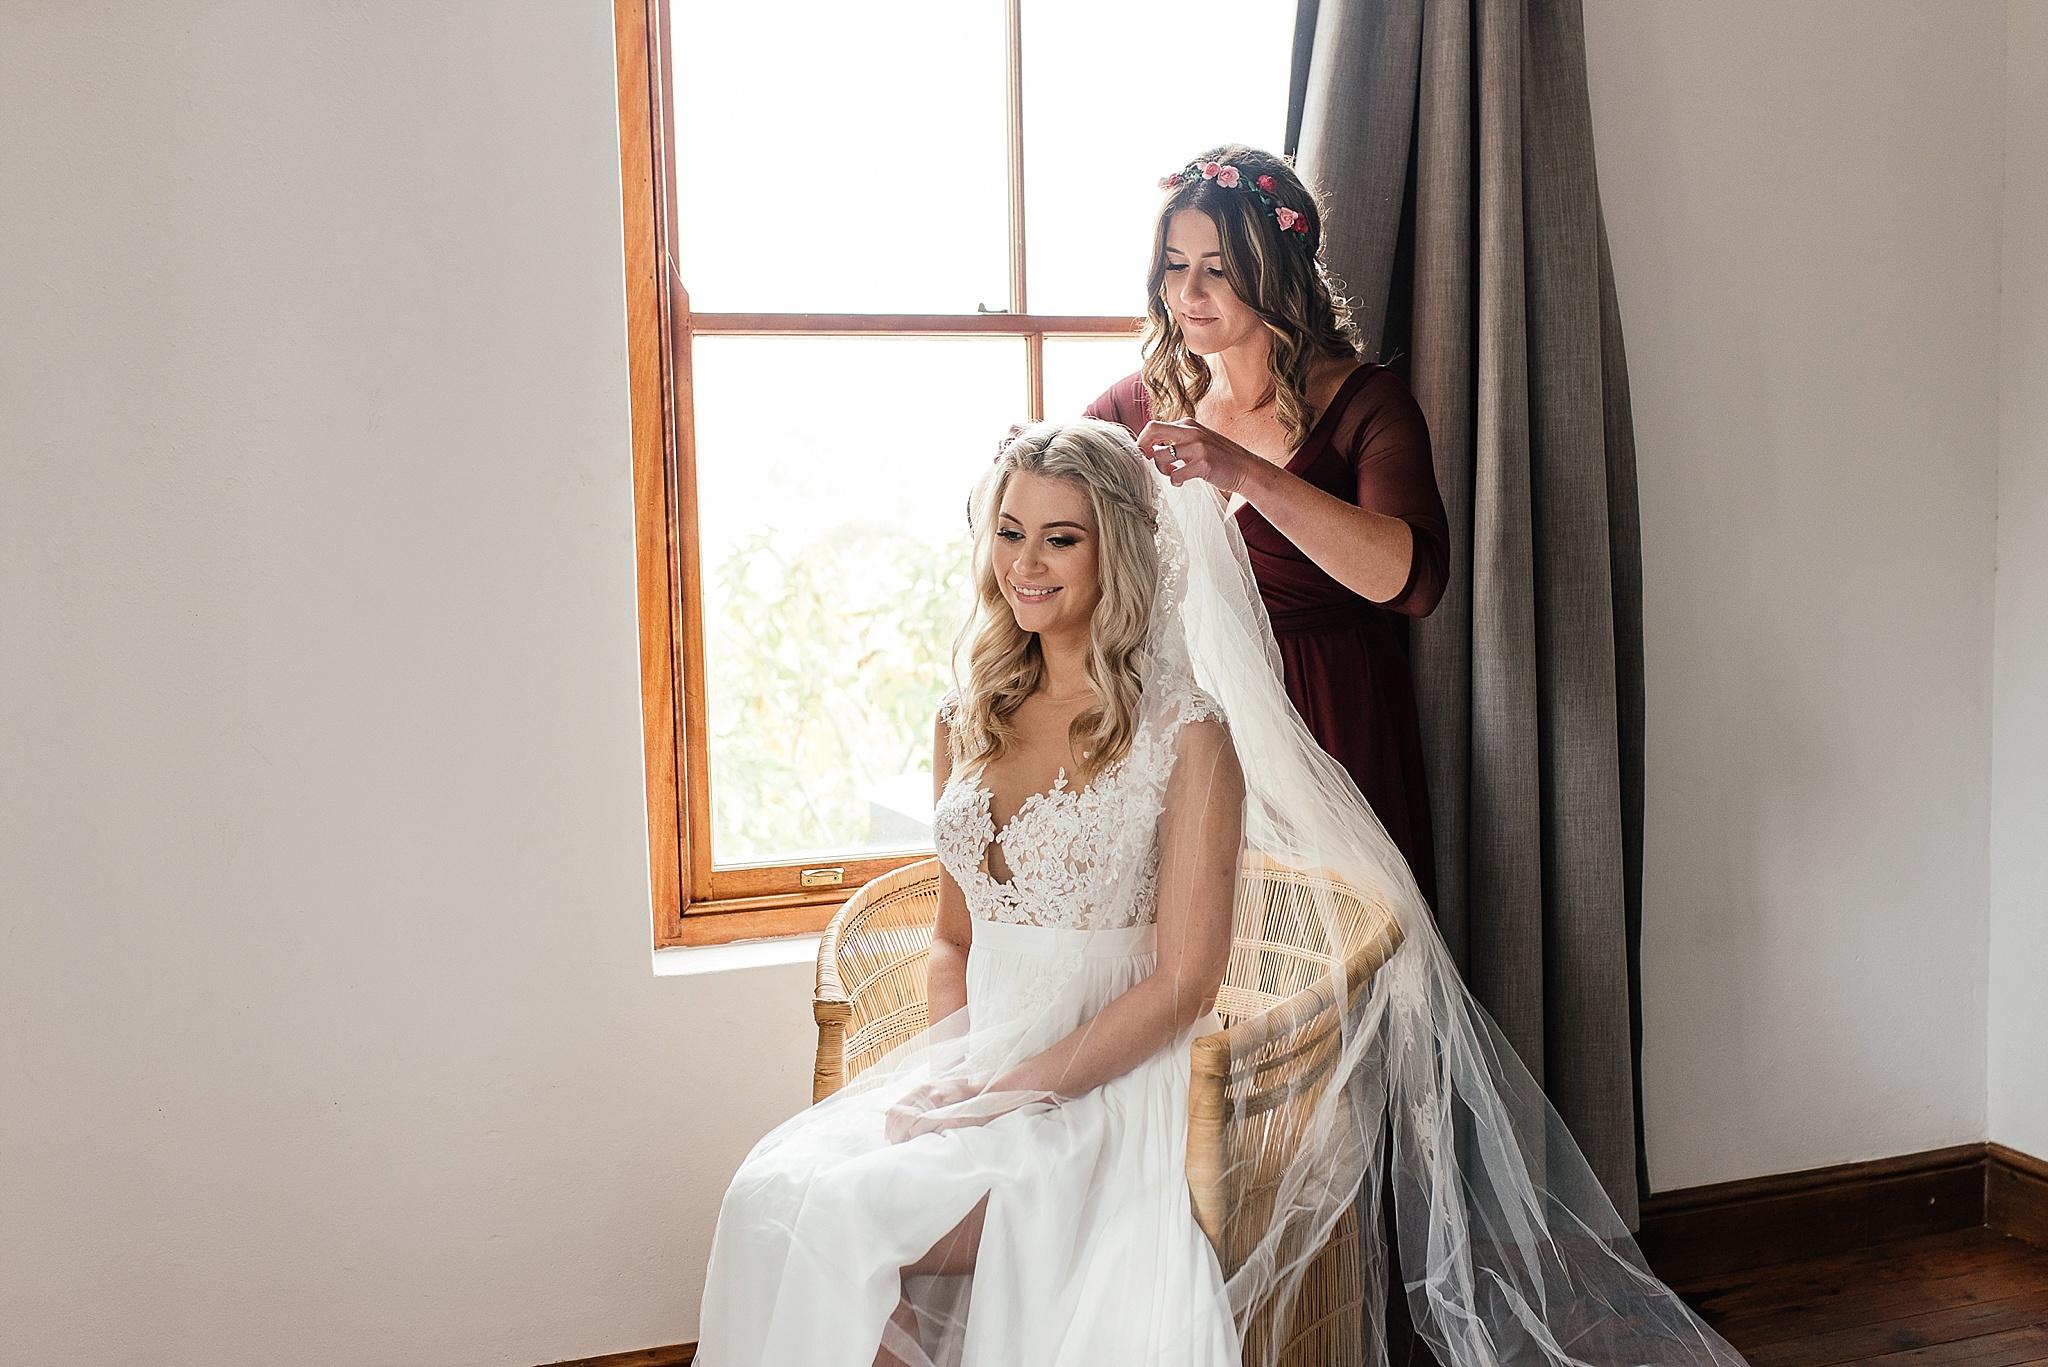 Cape Town Photographer Darren Bester - Die Woud Wedding - Gareth & Roxanne_0010.jpg